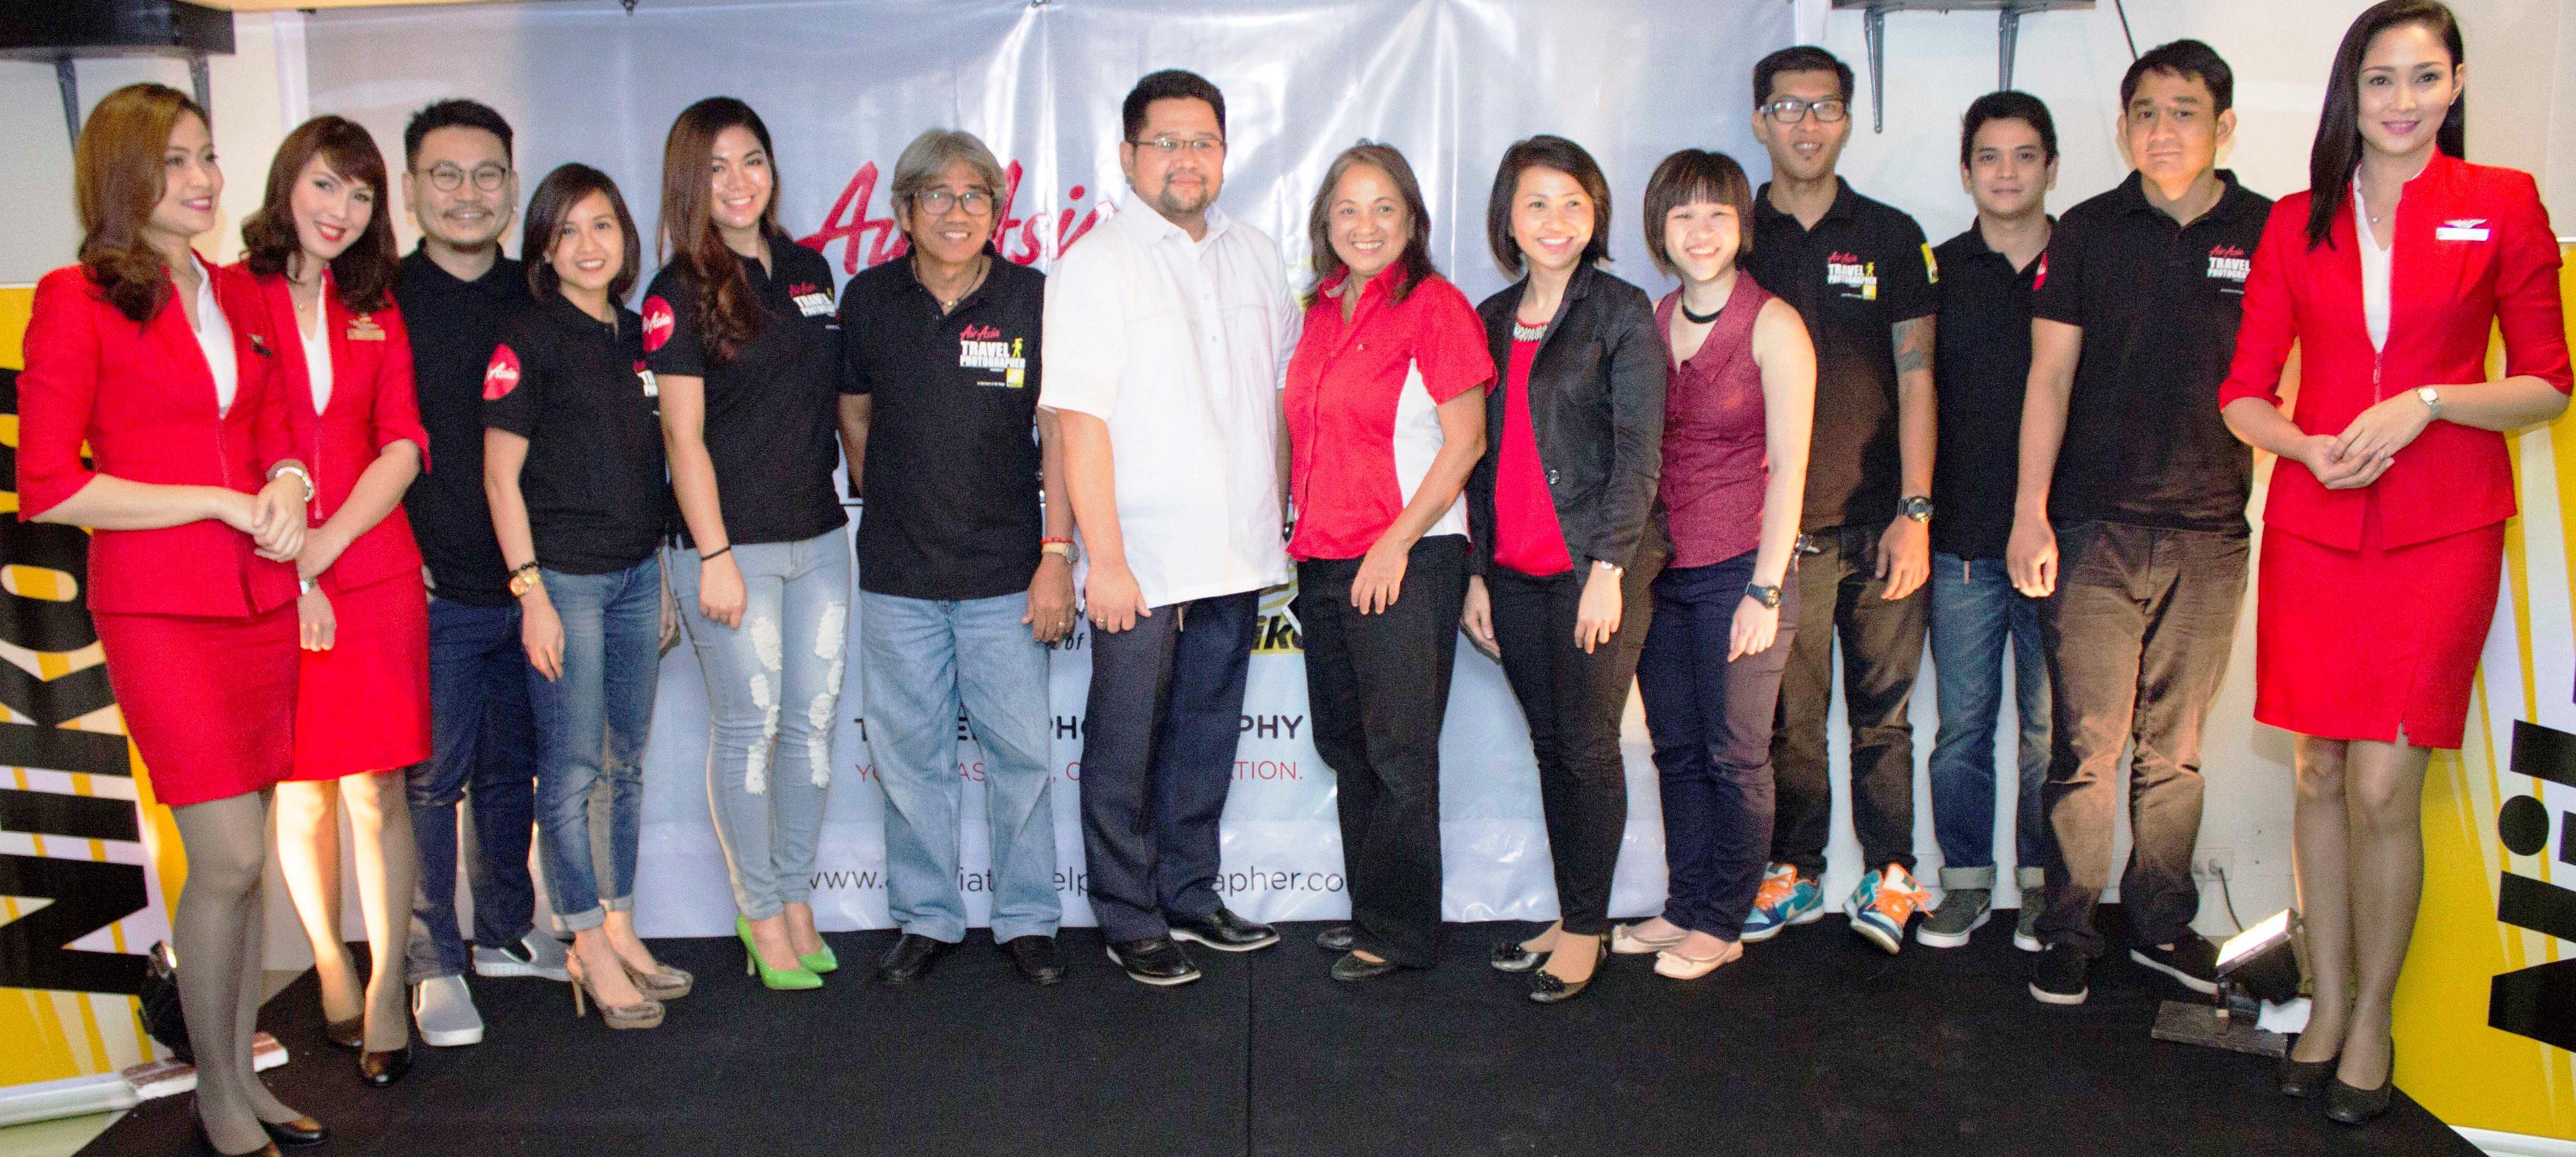 AirAsia, Nikon launch #IamAirAsiaTravelPhotographer contest